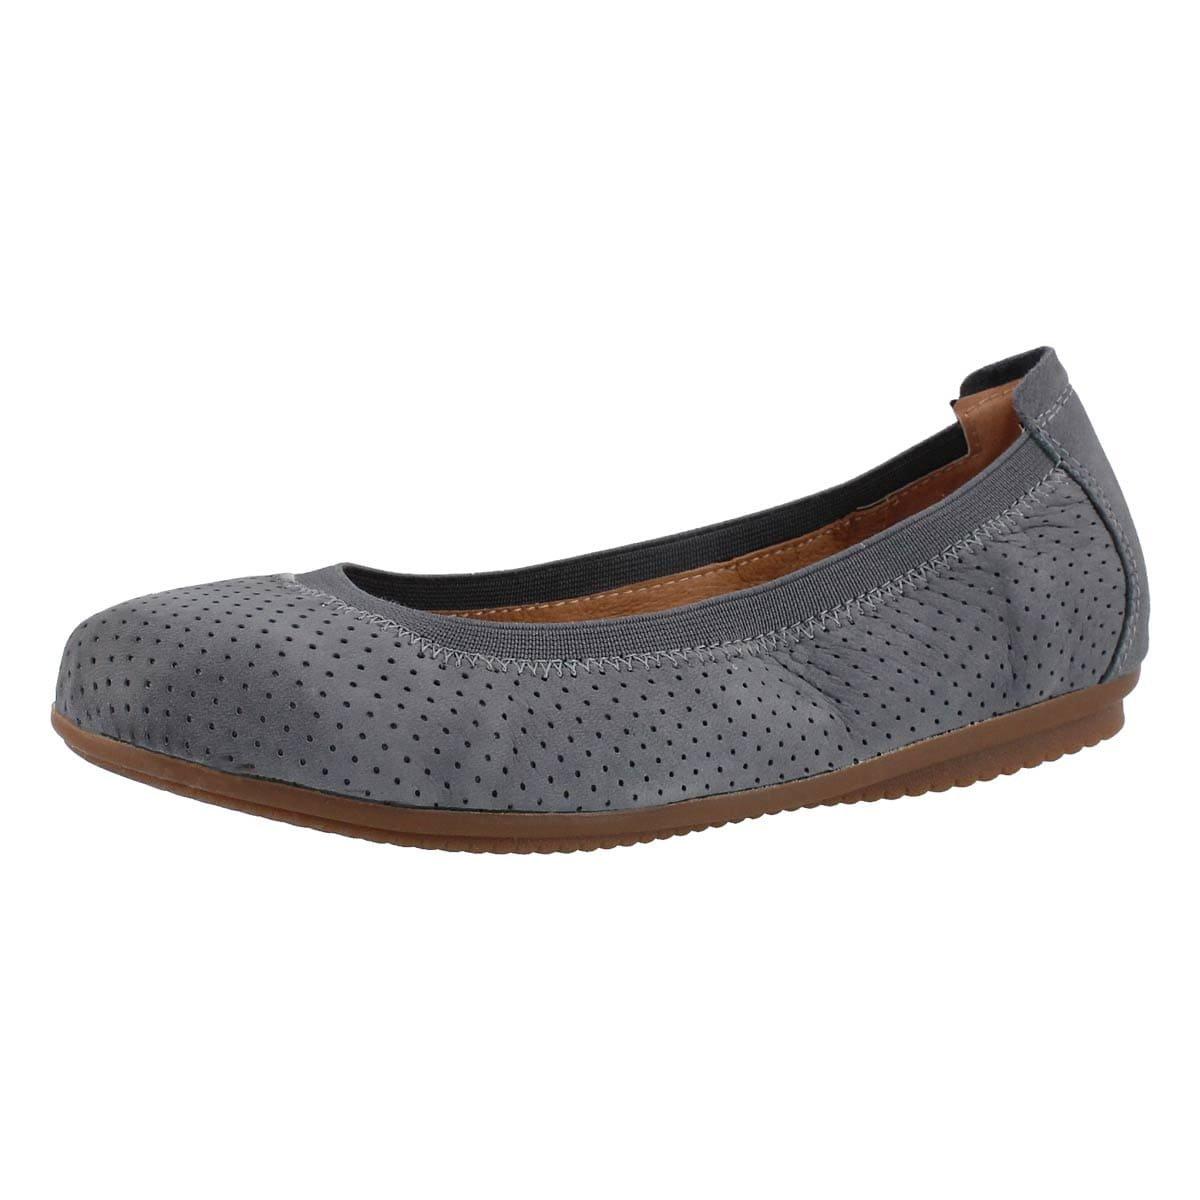 cb9efcfe3a7 Josef Seibel Women s Pippa 51 Ballerina Flat Jeans 36 M EU  Amazon.ca  Shoes    Handbags